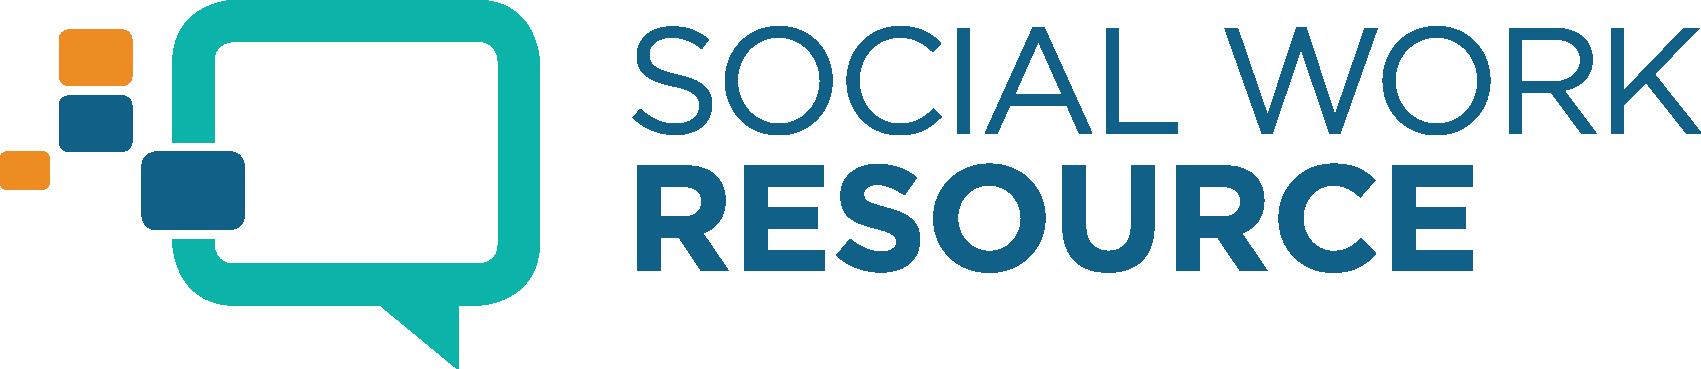 Social Work Resource